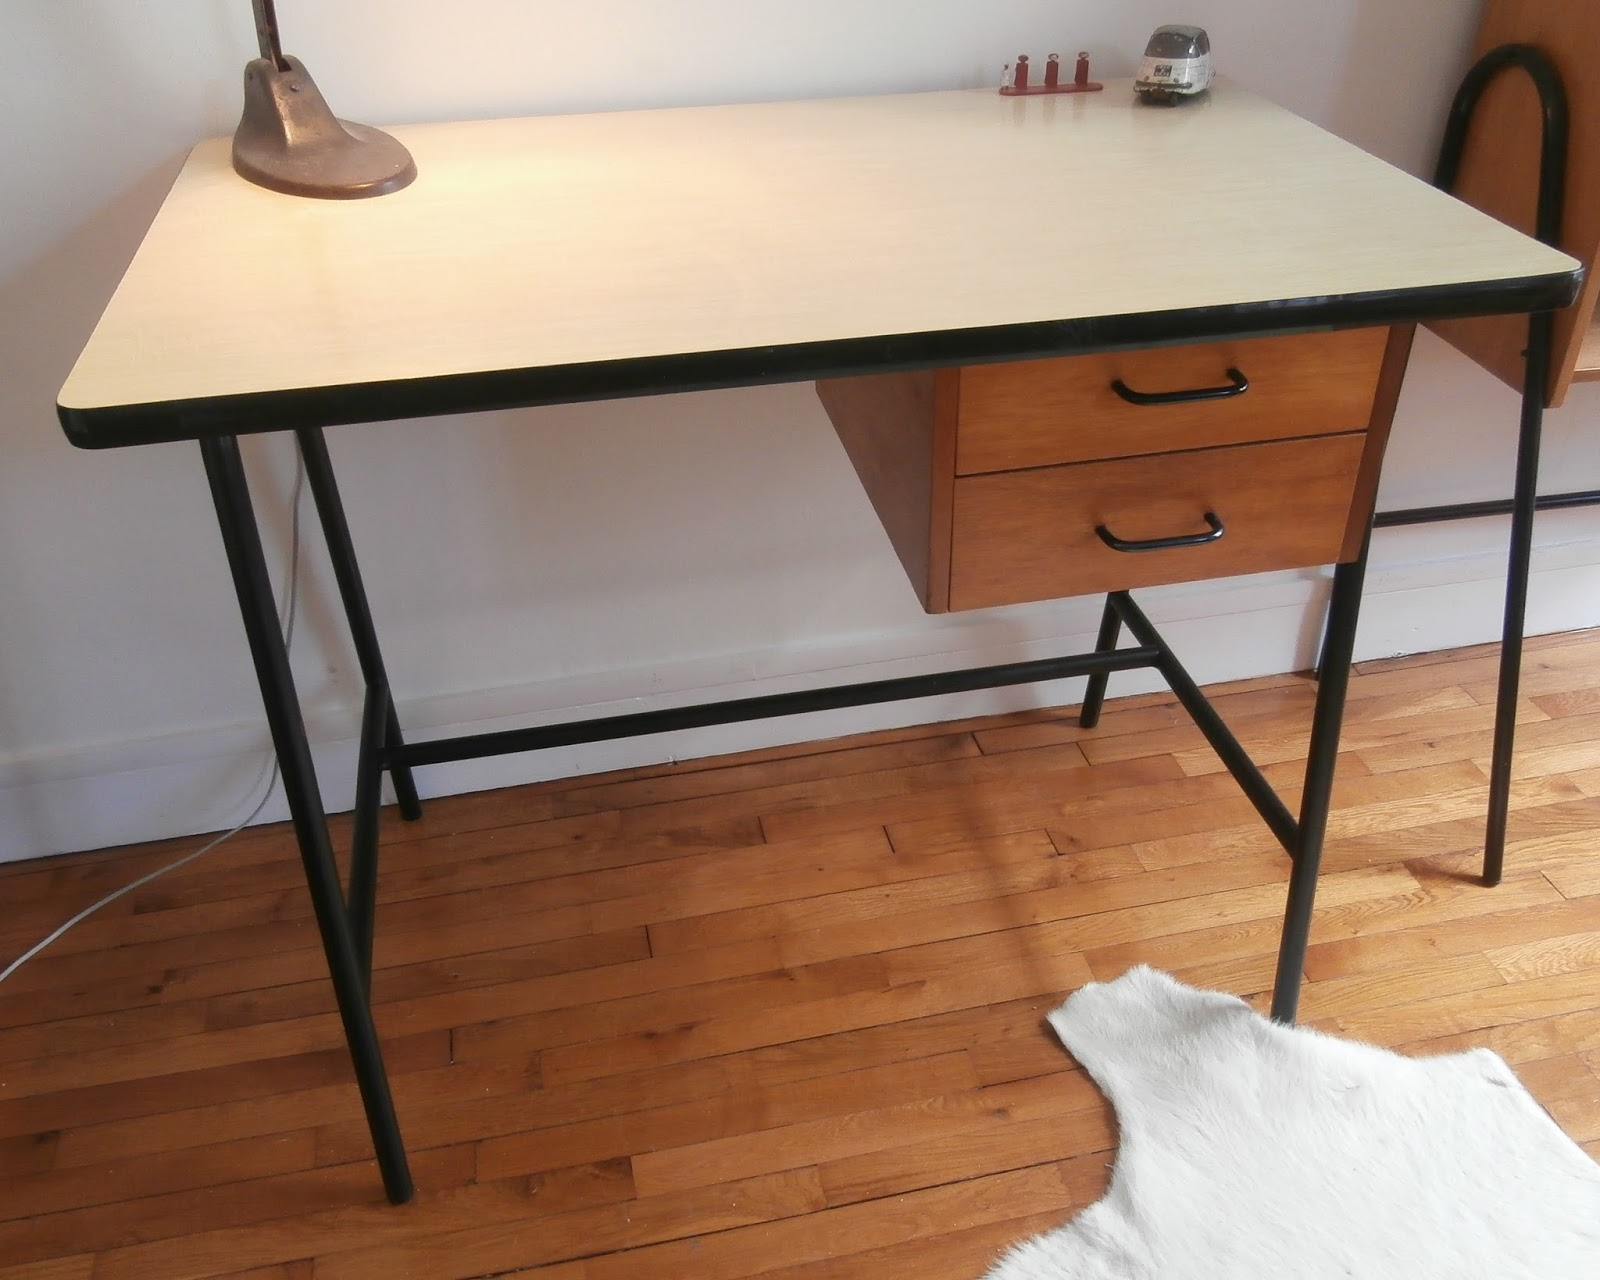 dur e de vie ind termin e bureau en formica pieds m tal. Black Bedroom Furniture Sets. Home Design Ideas